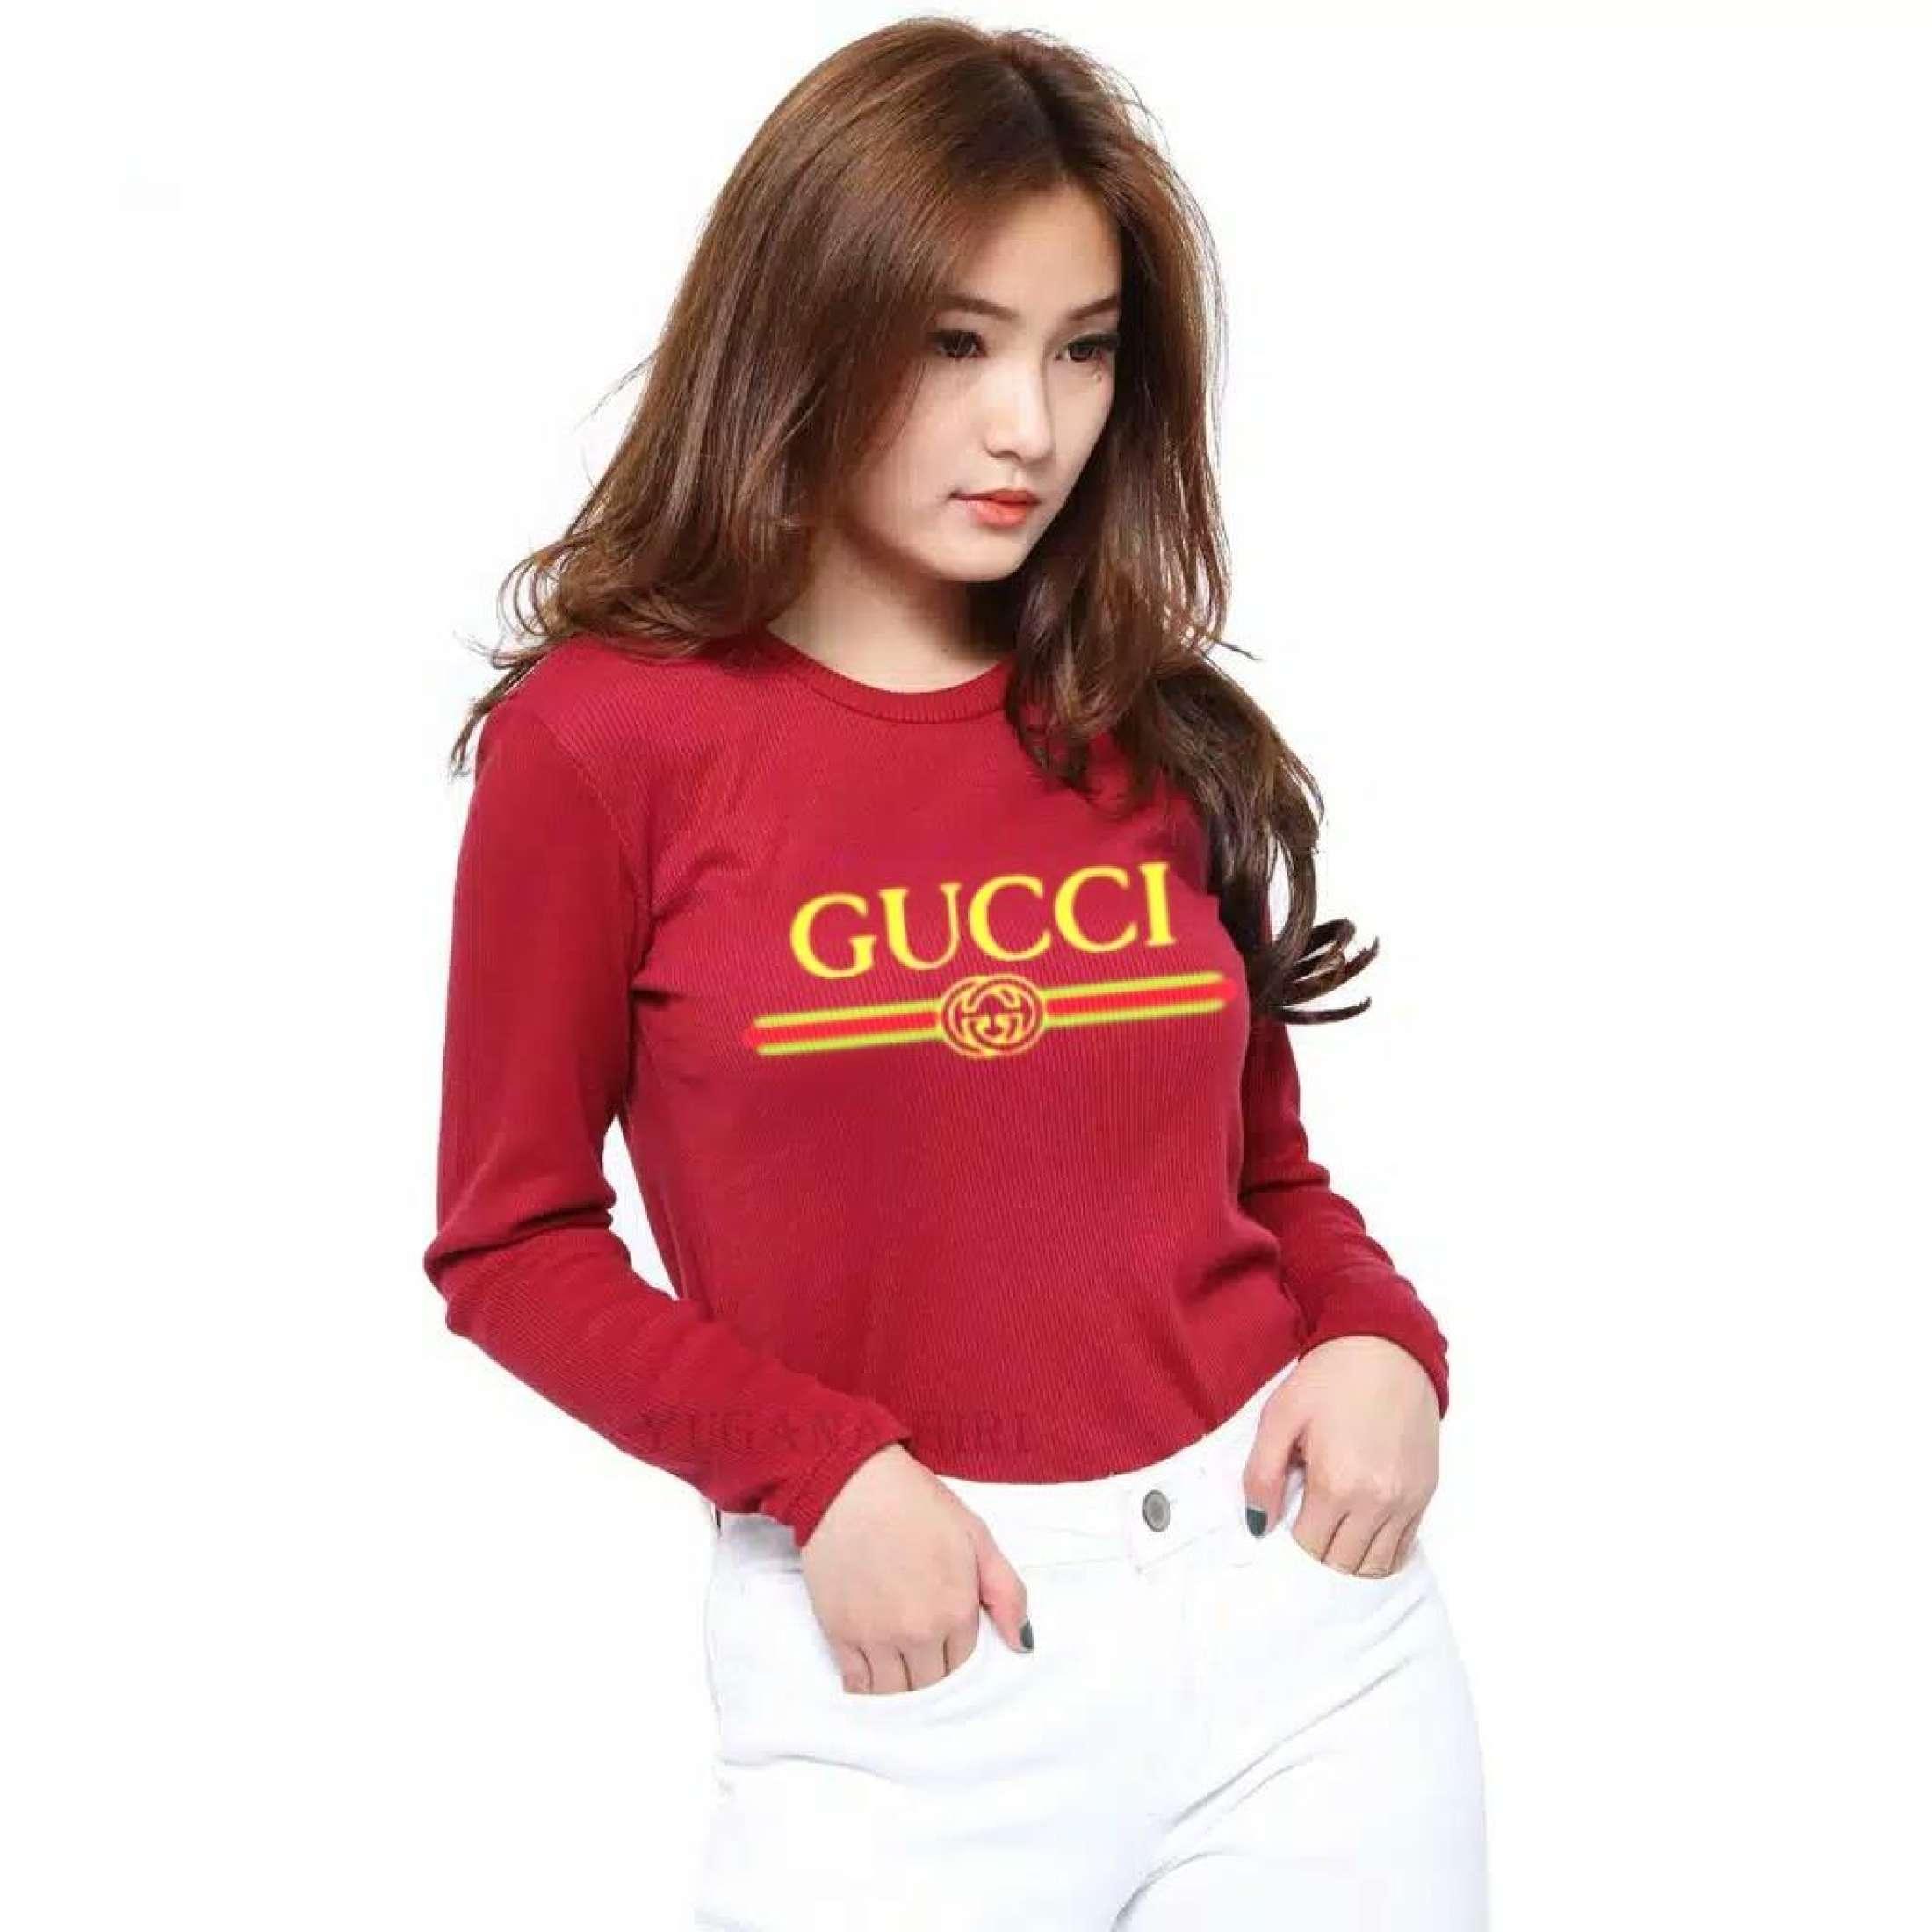 TERBARU!!! Cantik.Fashion Tshirt/ Kaos Wanita. Baju Atasan Guecci Lengan Panjang